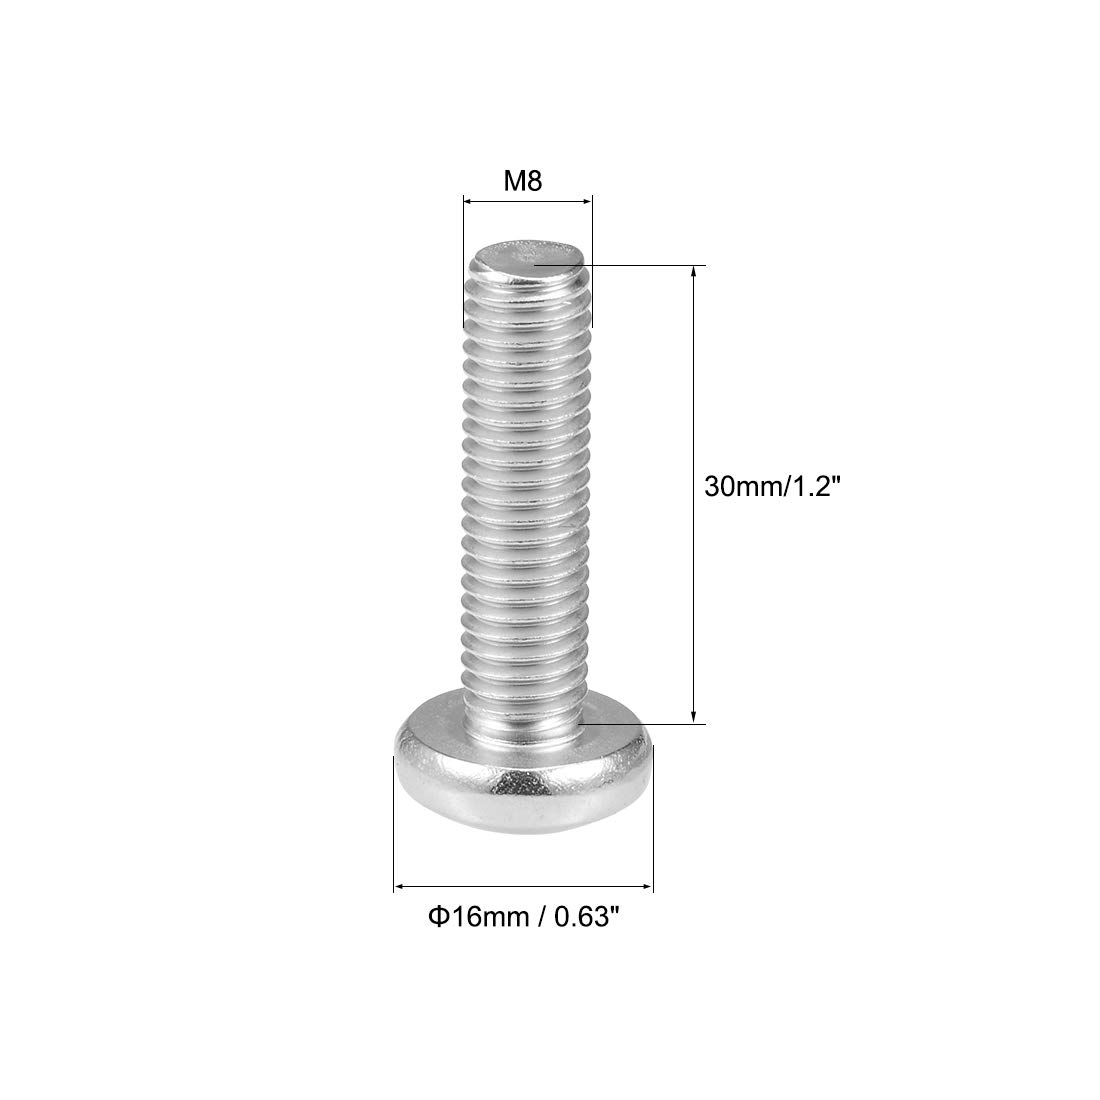 uxcell/® M8x30mm Machine Screws Pan Phillips Cross Head Screw 304 Stainless Steel Fasteners Bolts 5Pcs